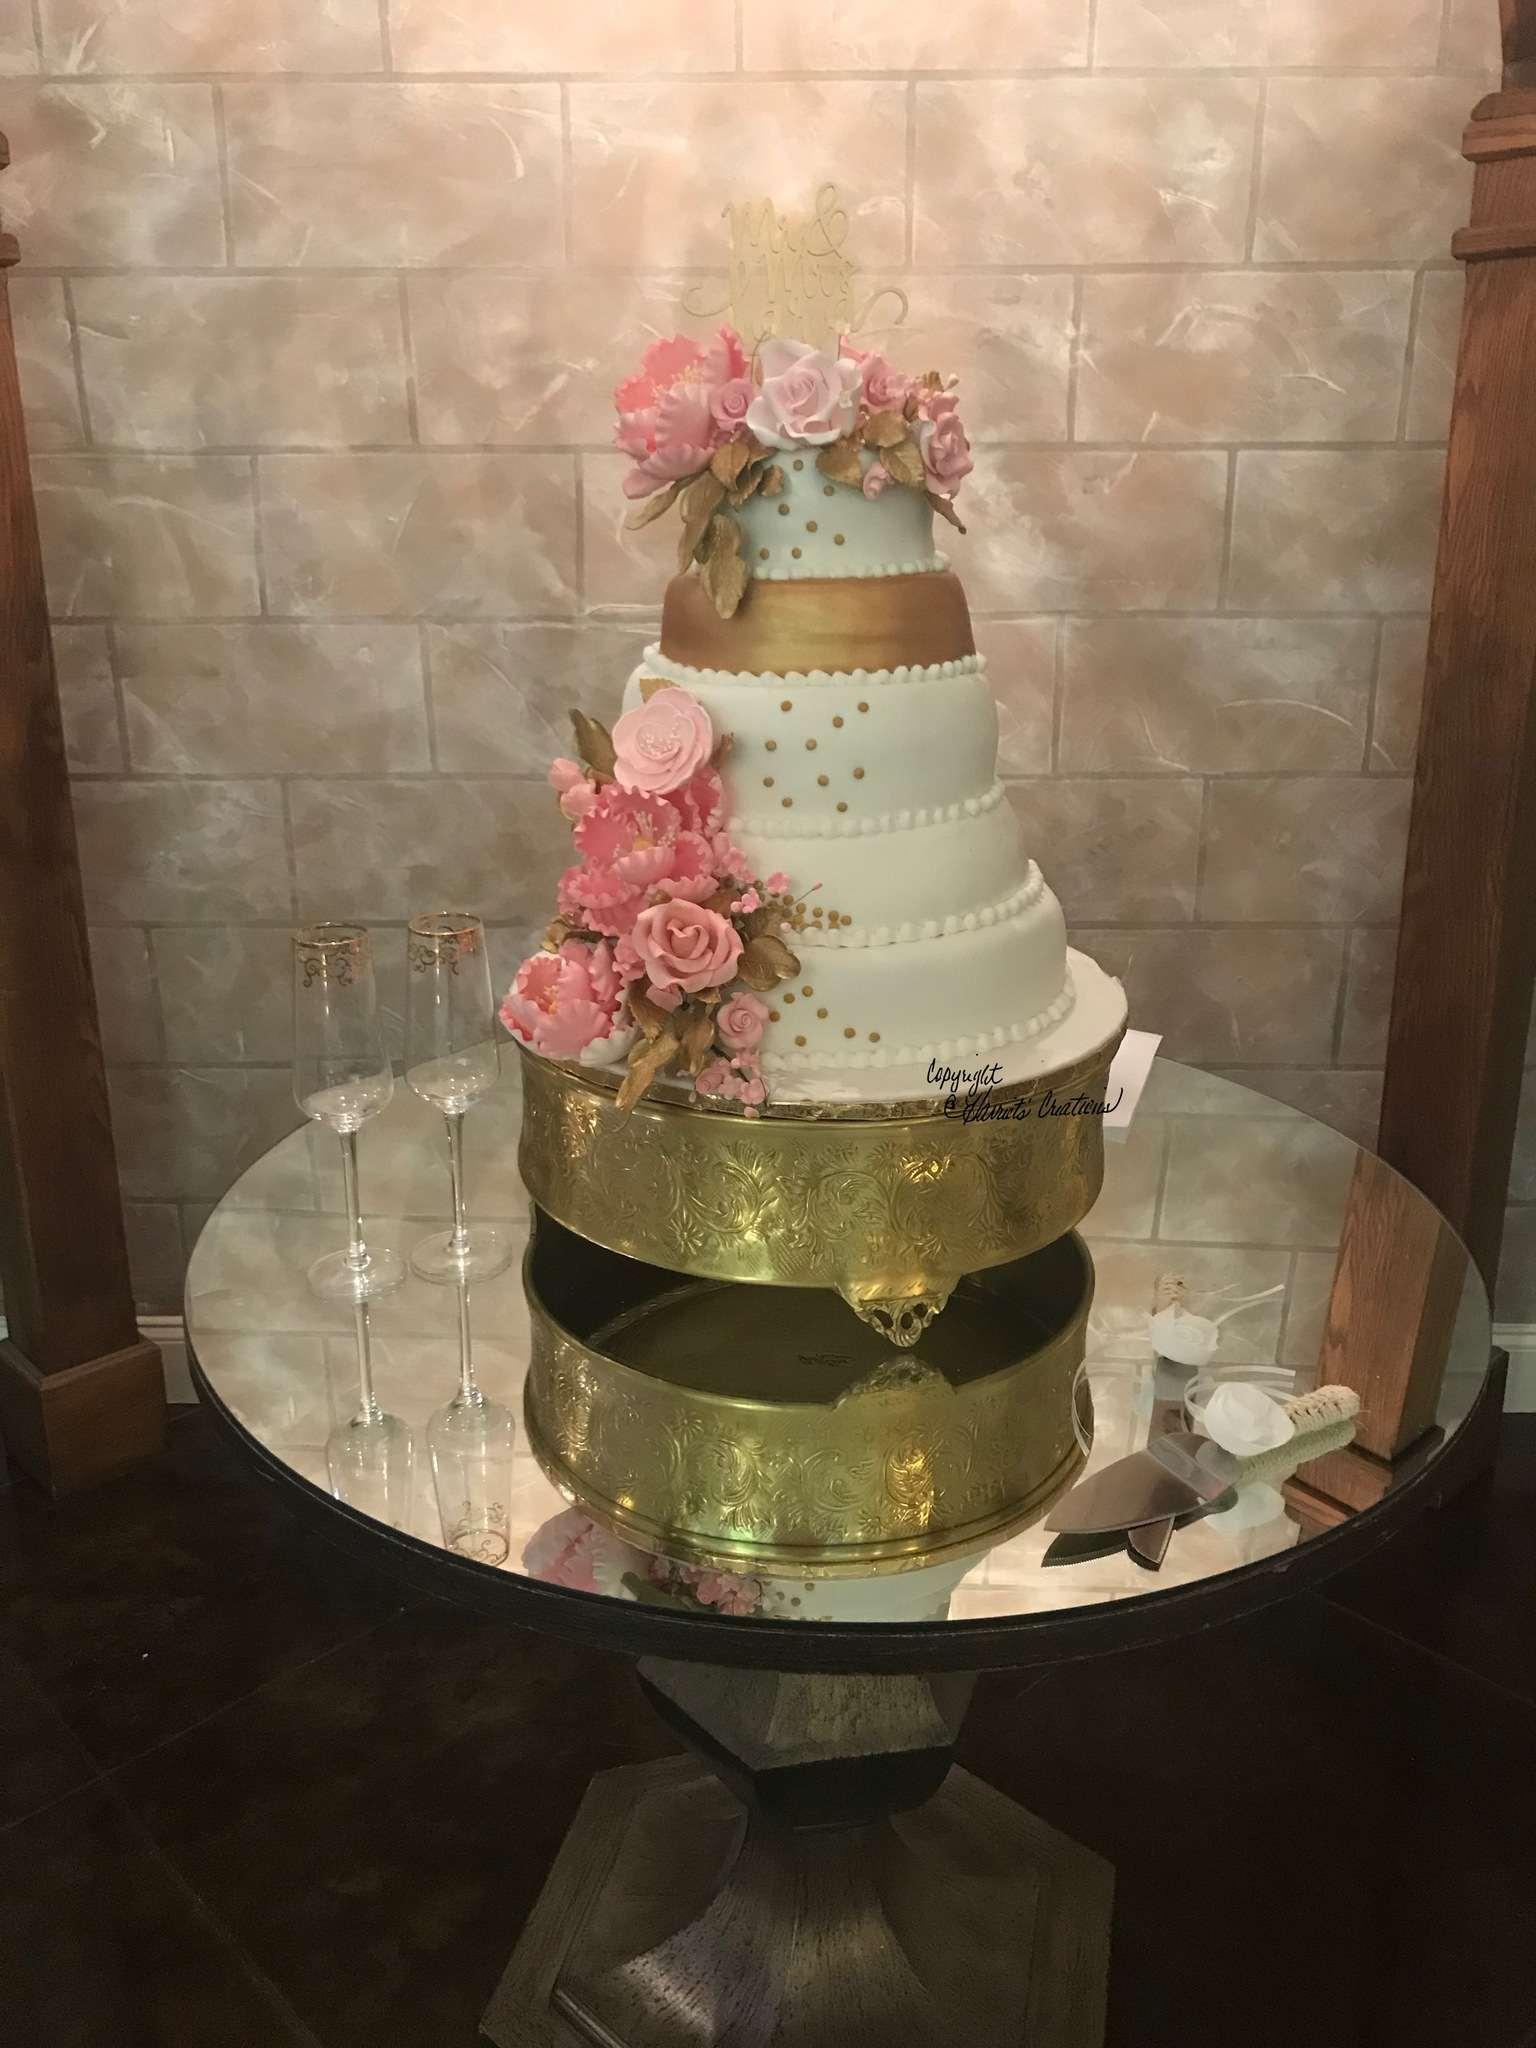 fondant wedding cake with peonies